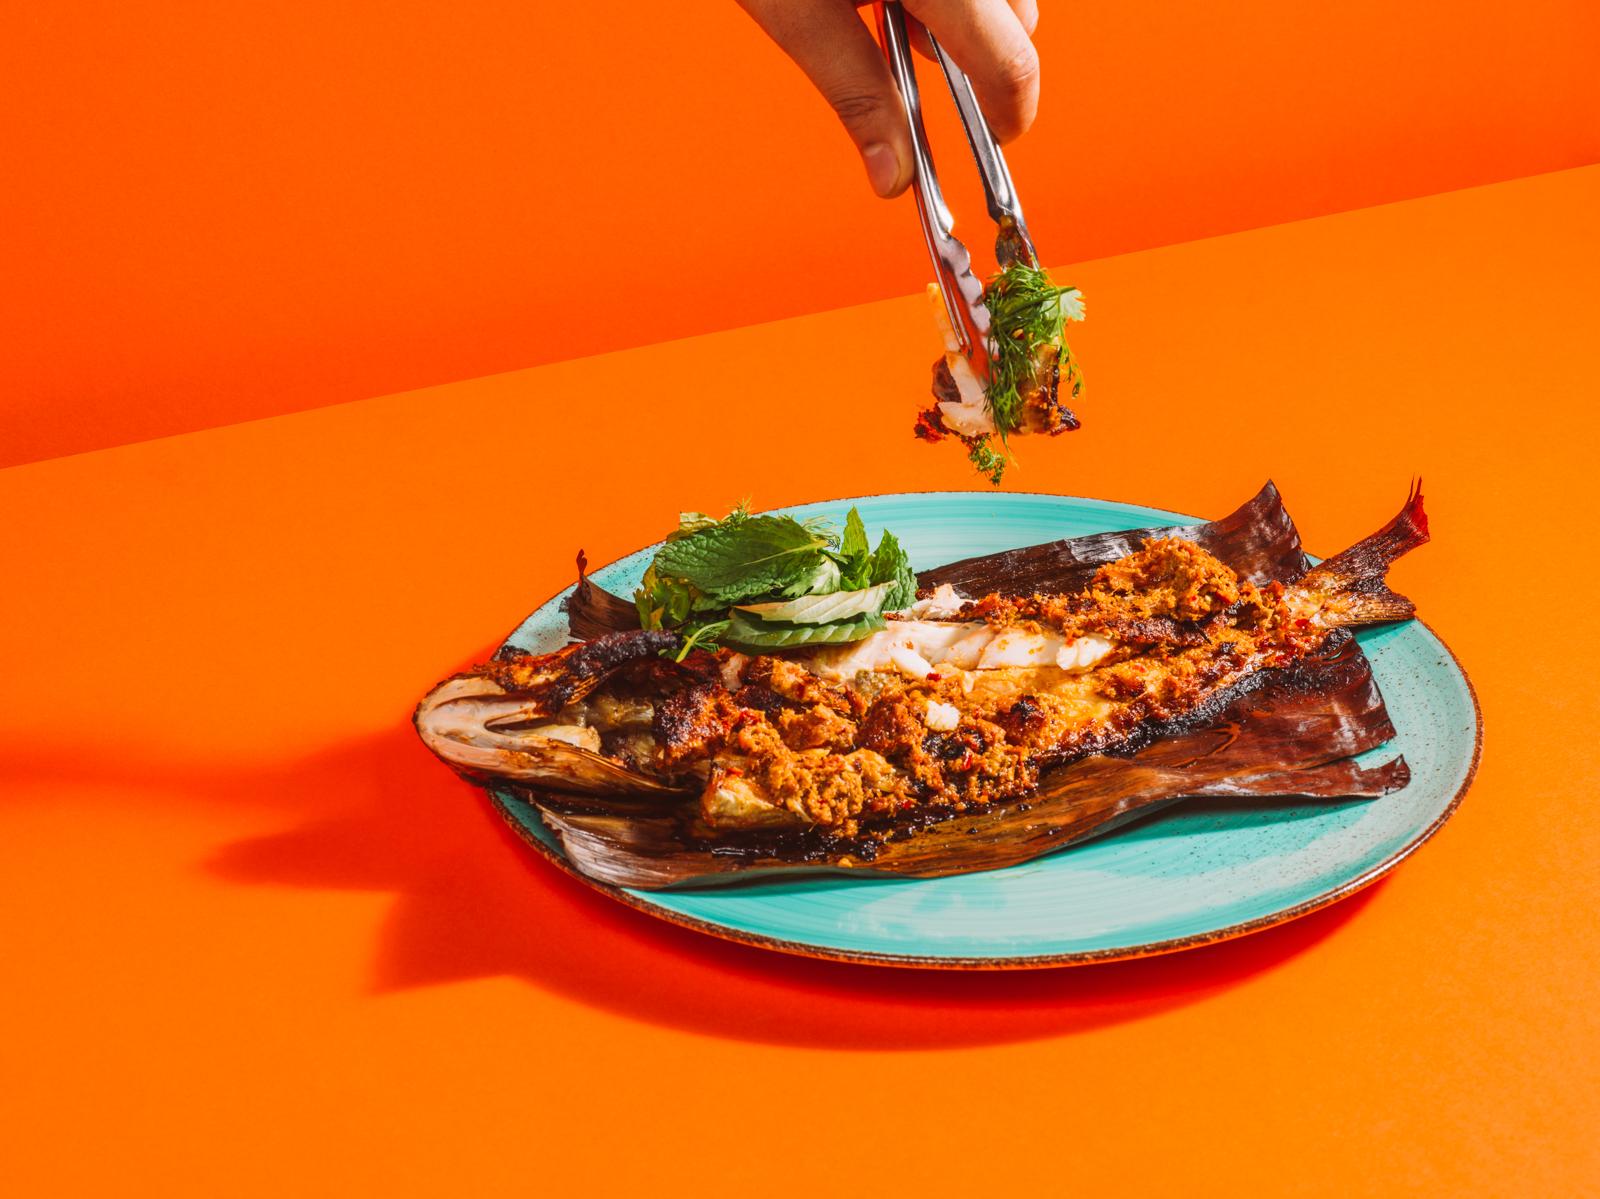 Rice-and-Gold-Food-All-Good-NYC-Nick-Johnson-Photography-13.JPG